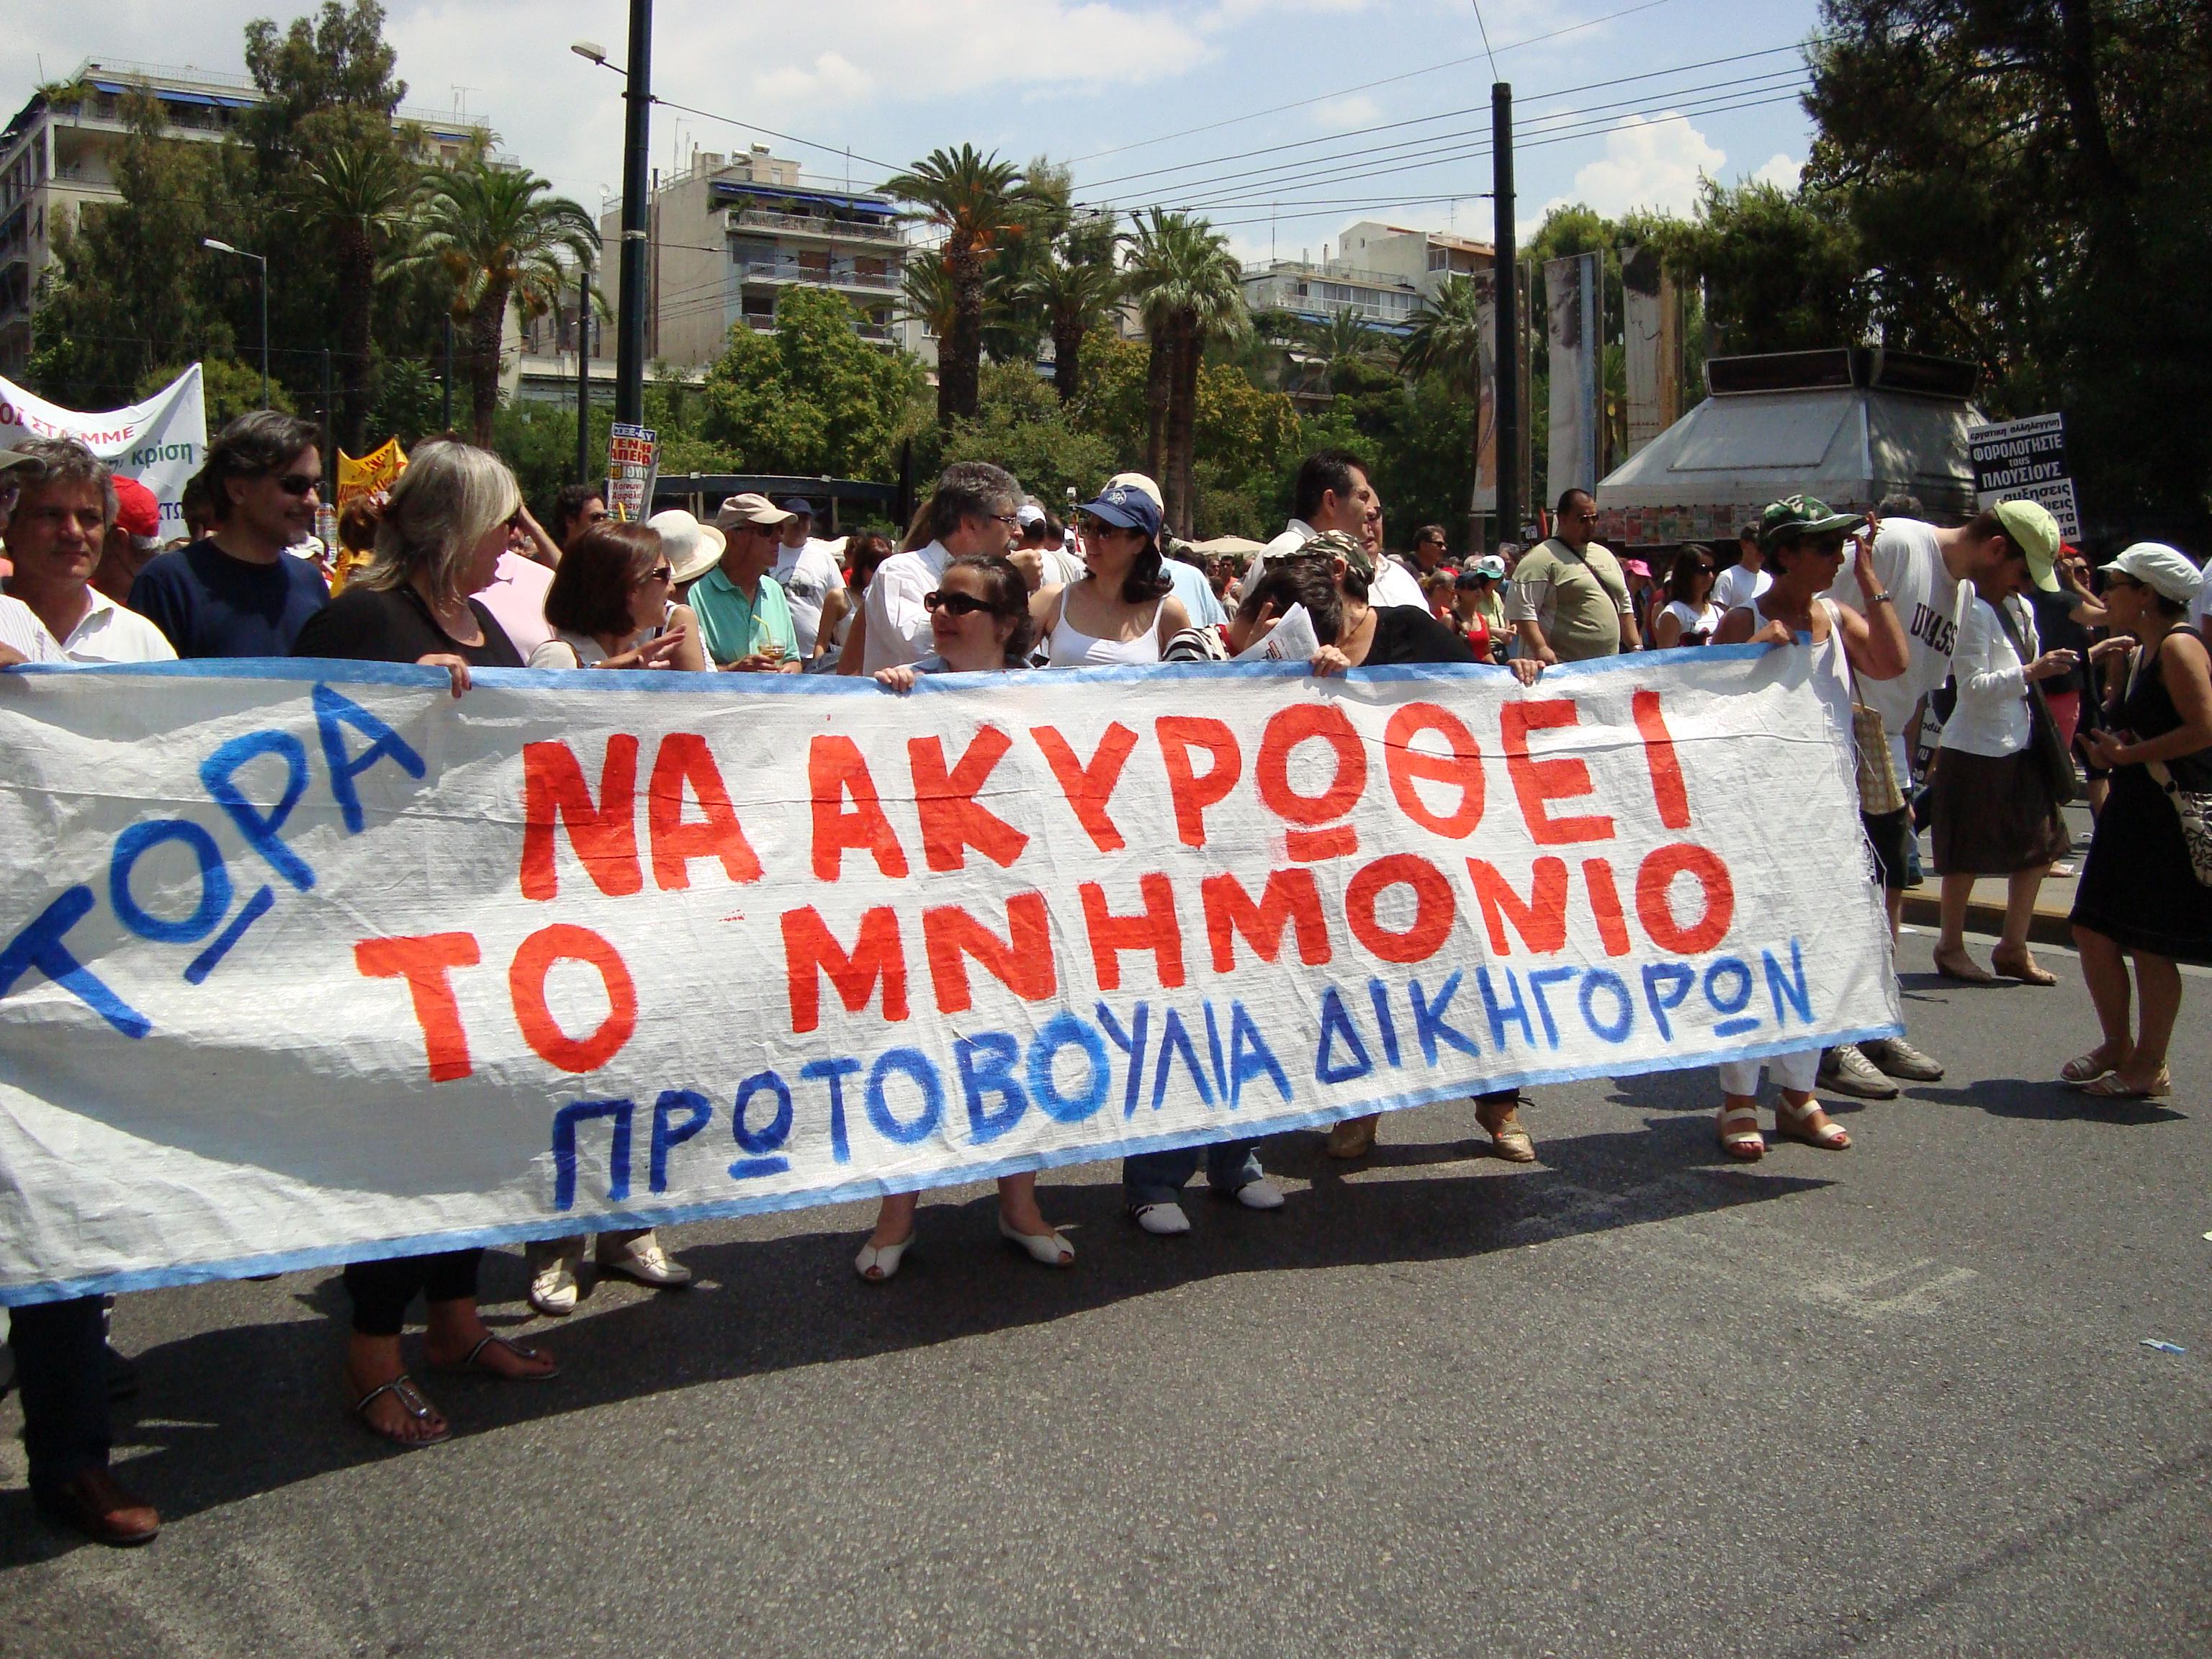 _29  2010 008